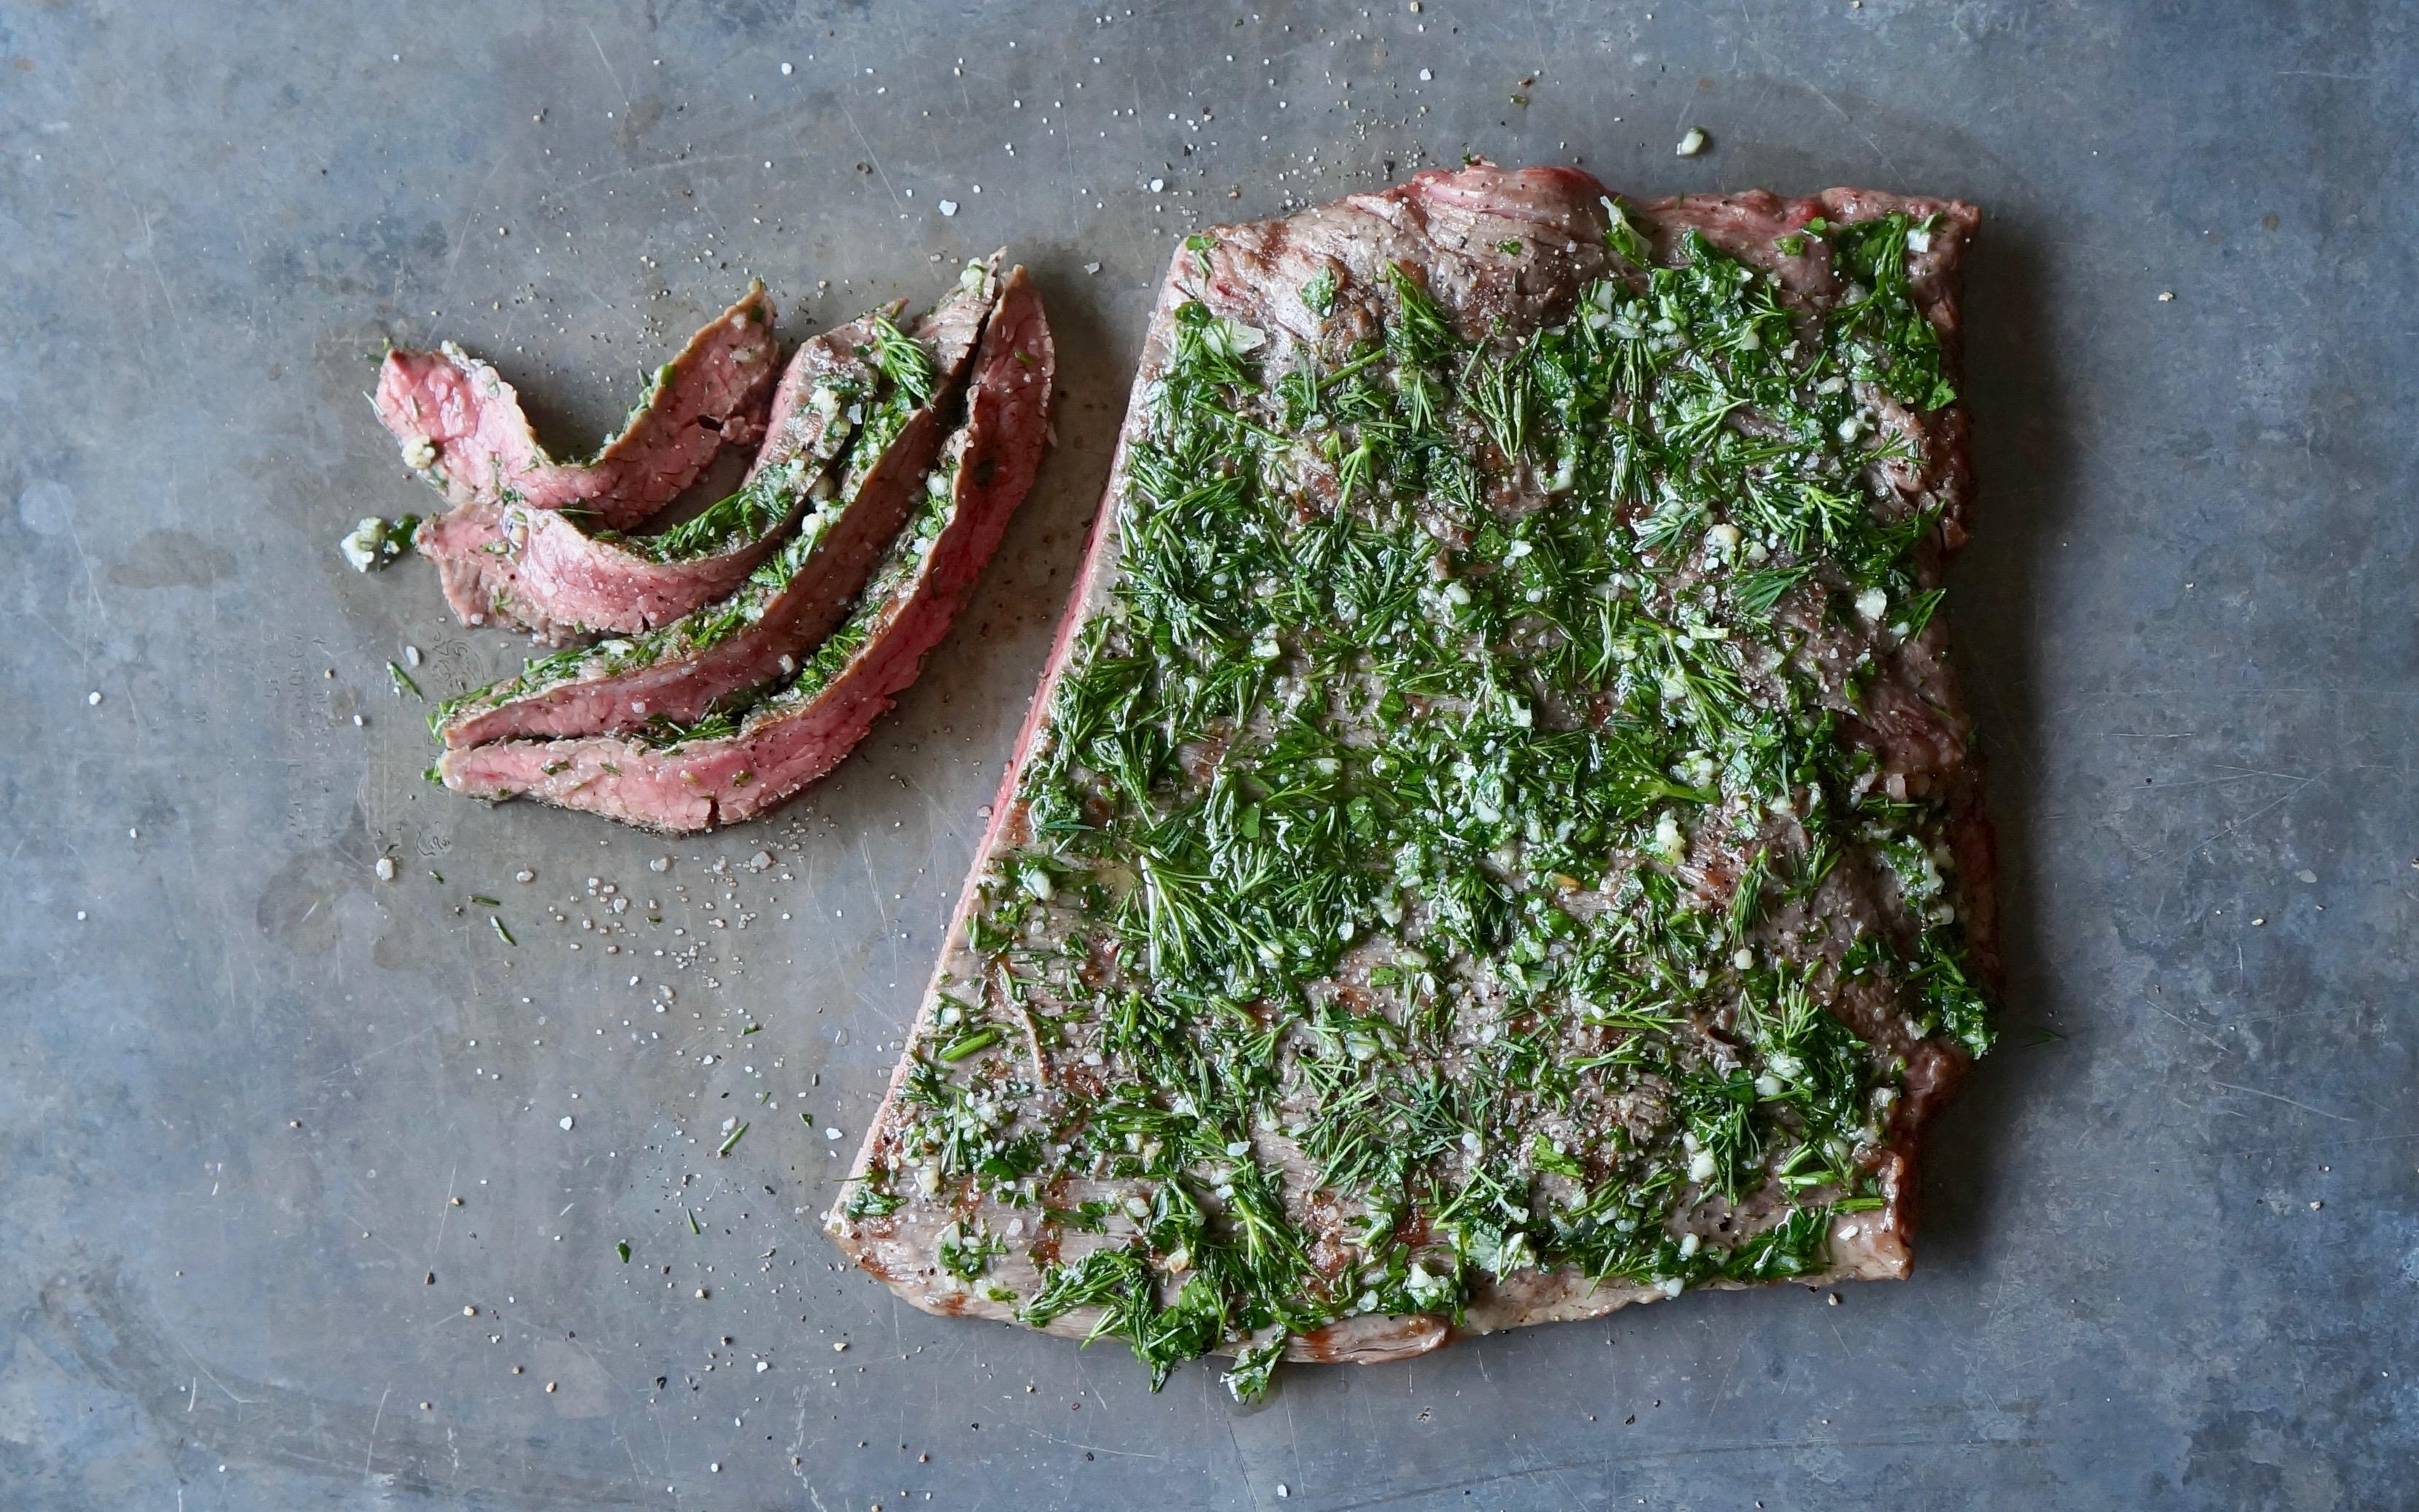 Fresh-Herb-Flank-Steak-Rebecca-Gordon-Editor-In-Chief-Buttermilk-Lipstick-Culinary-Entertaining-Techniques-Southern-Hostess-RebeccaGordon-Pastry-Chef-Buttermilk-Lipstick-RebeccaGordon-Pastry-Chef-Birmingham-Alabama